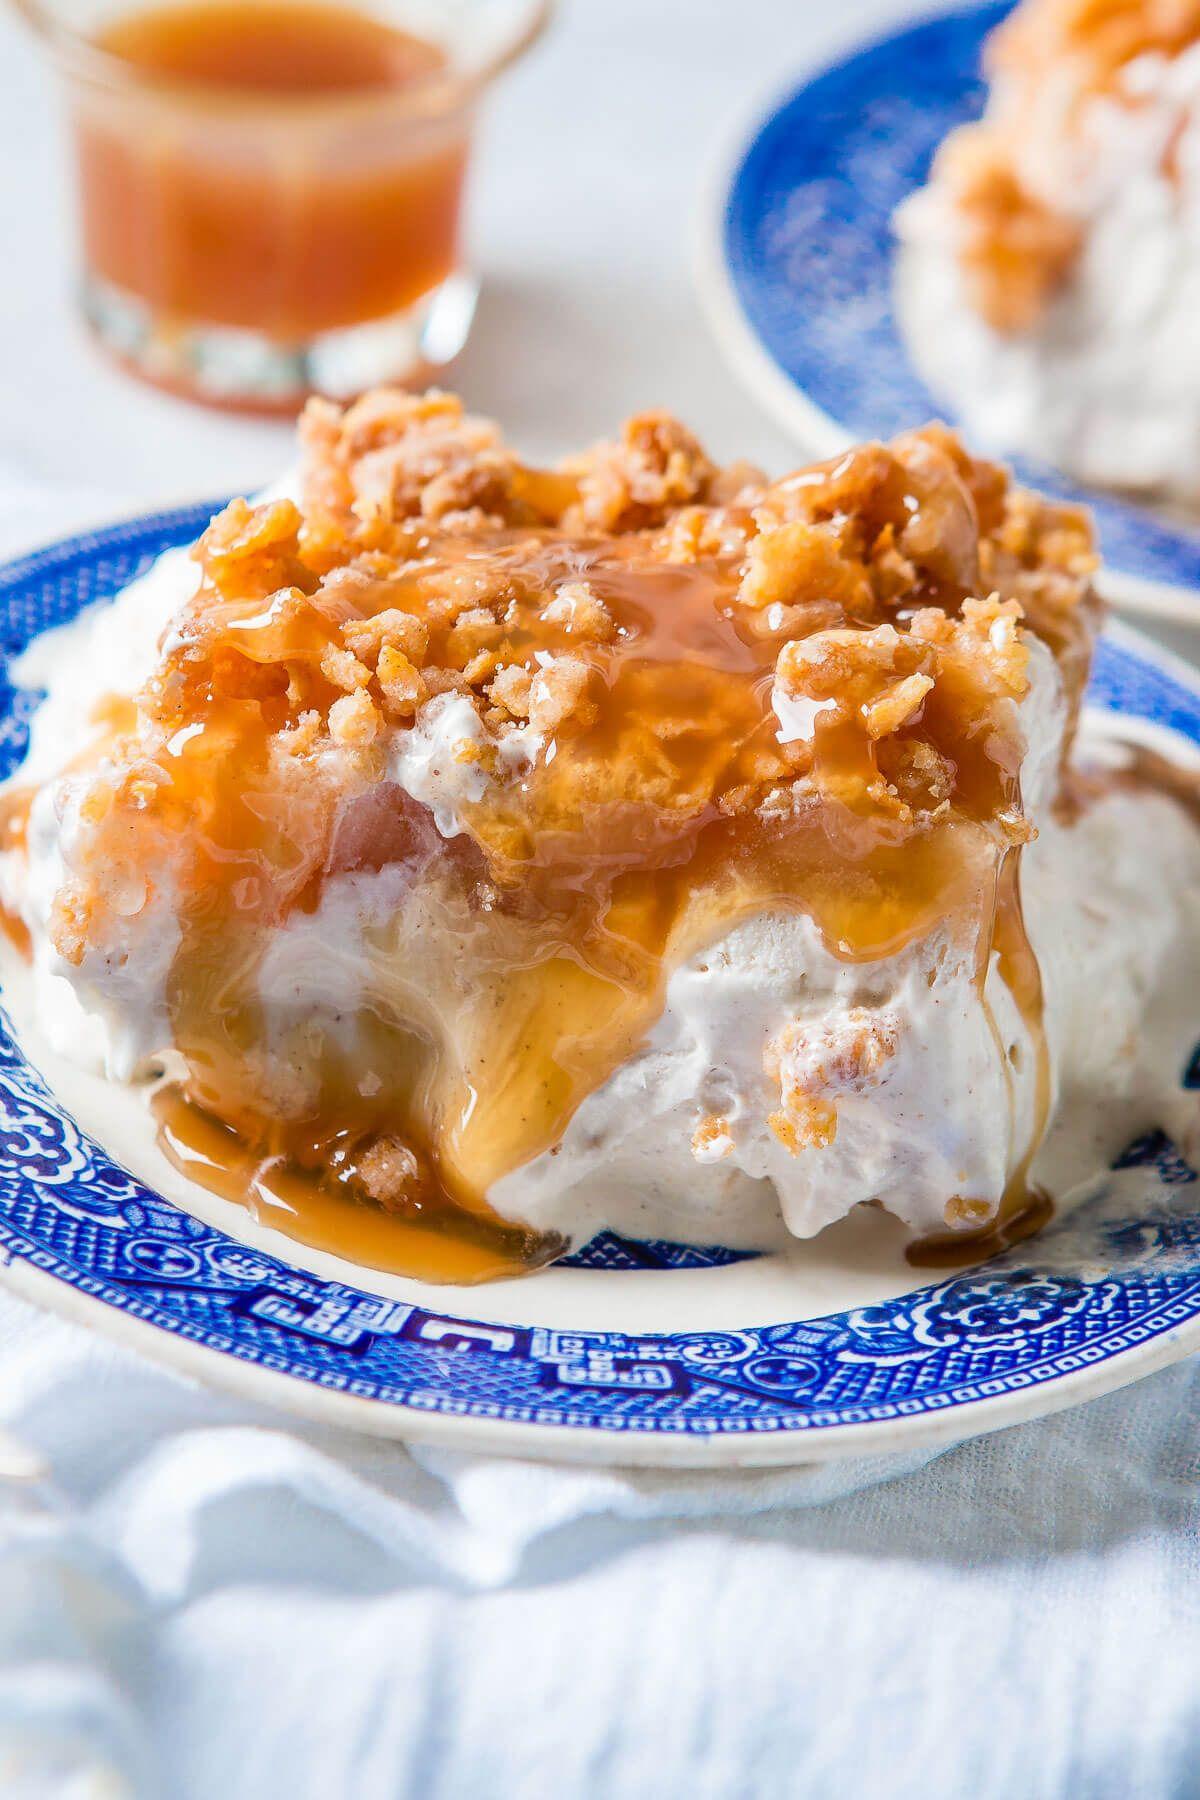 Apple Pie Fried Ice Cream Cake Recipe Fried ice cream